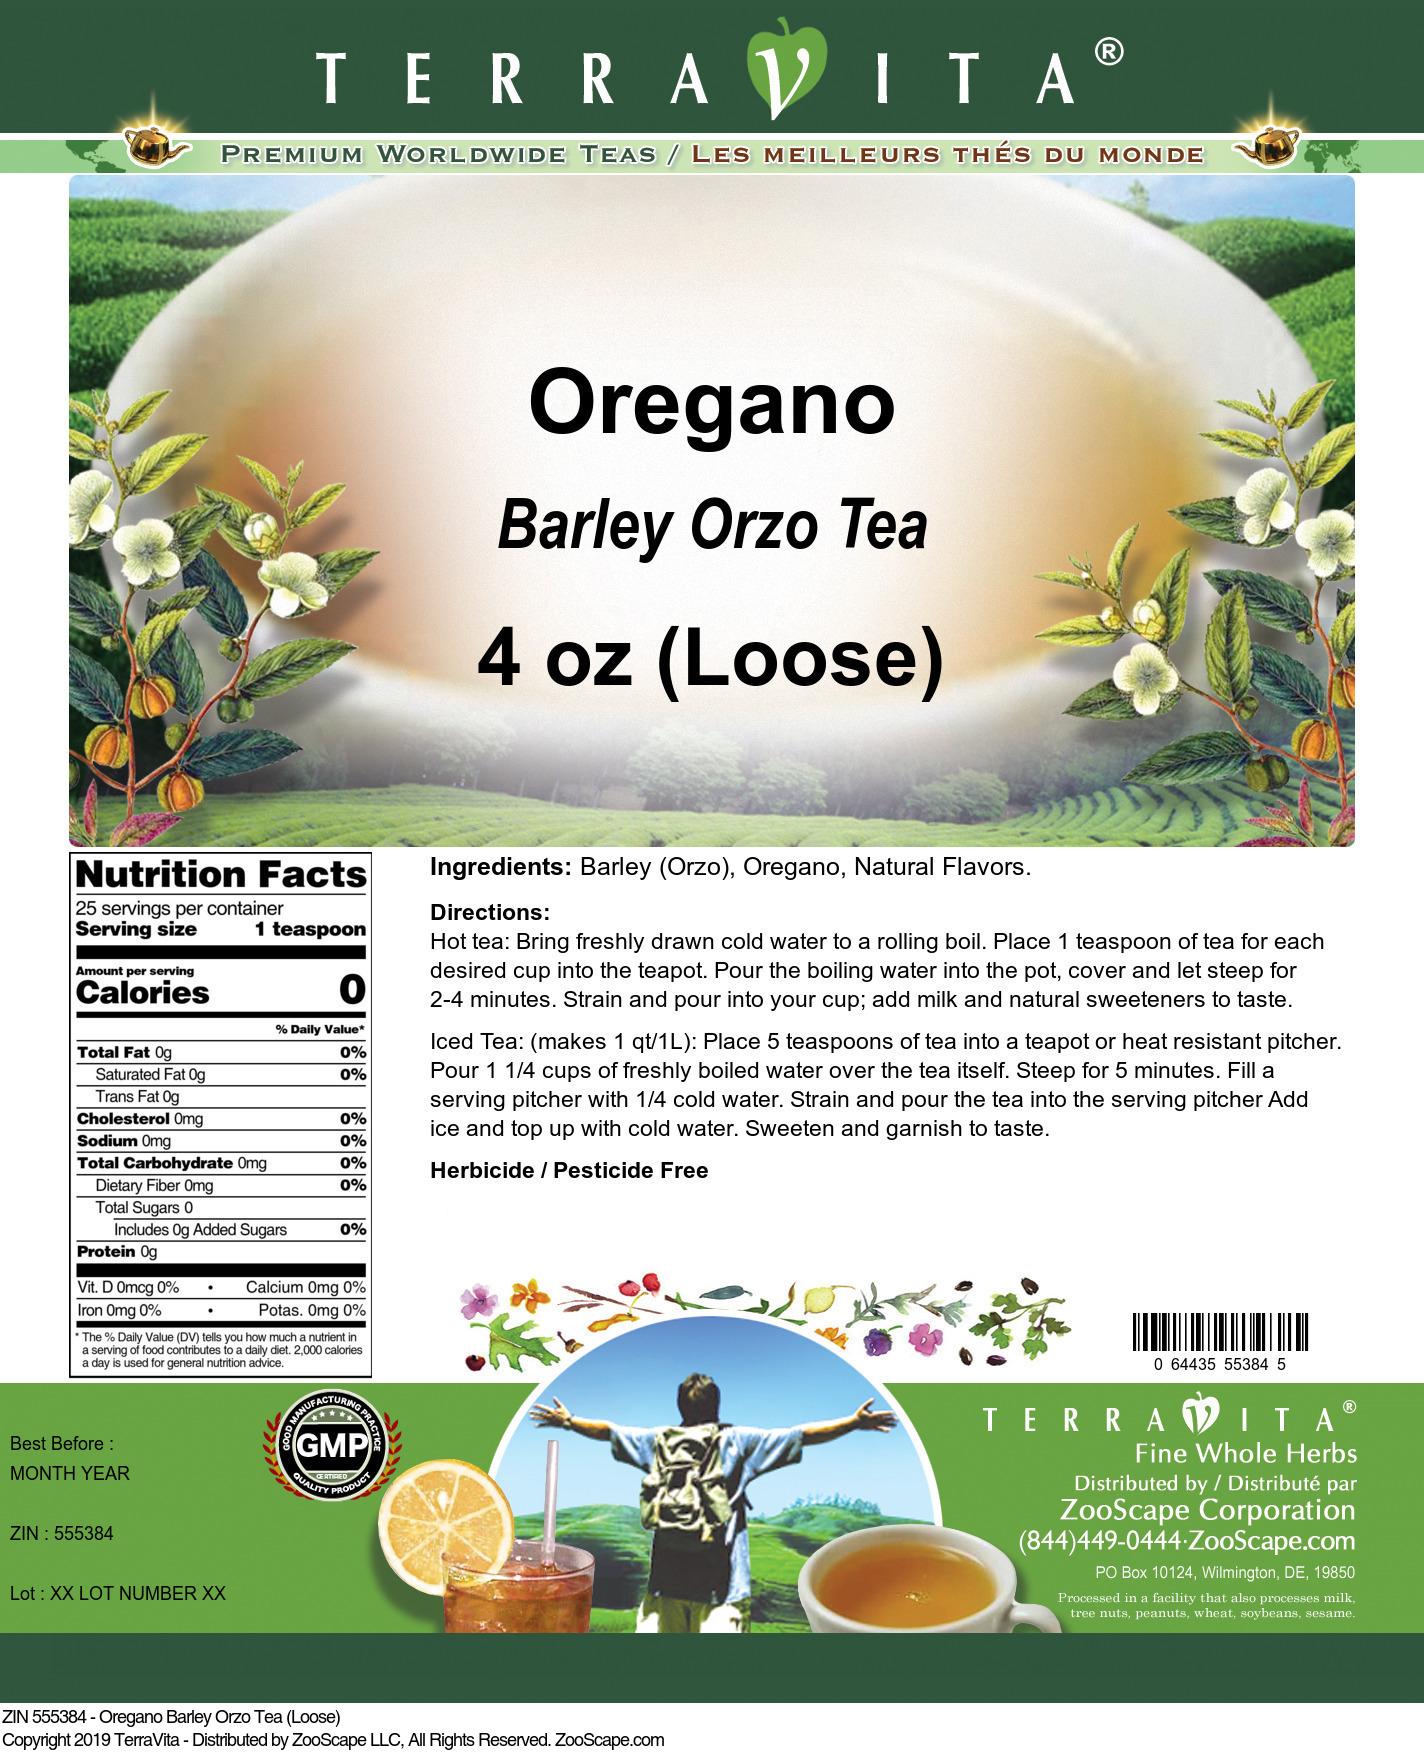 Oregano Barley Orzo